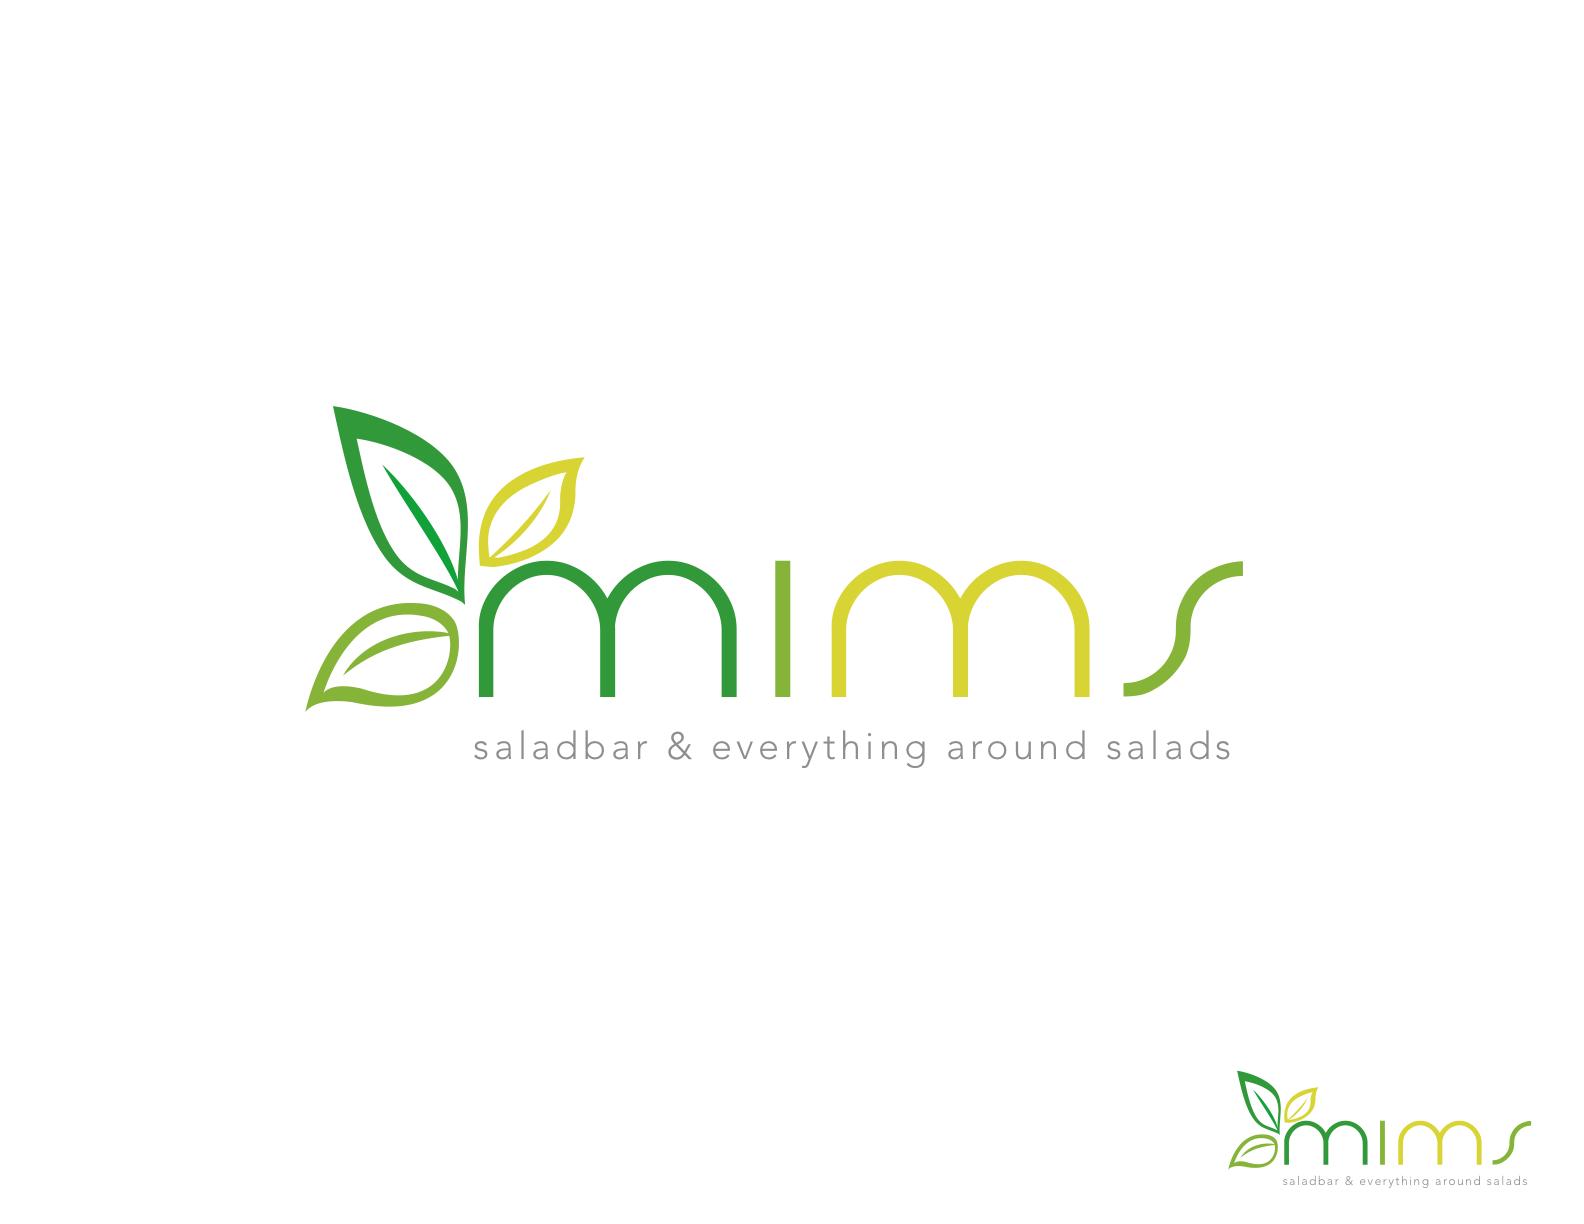 Saladbar needs a new logo